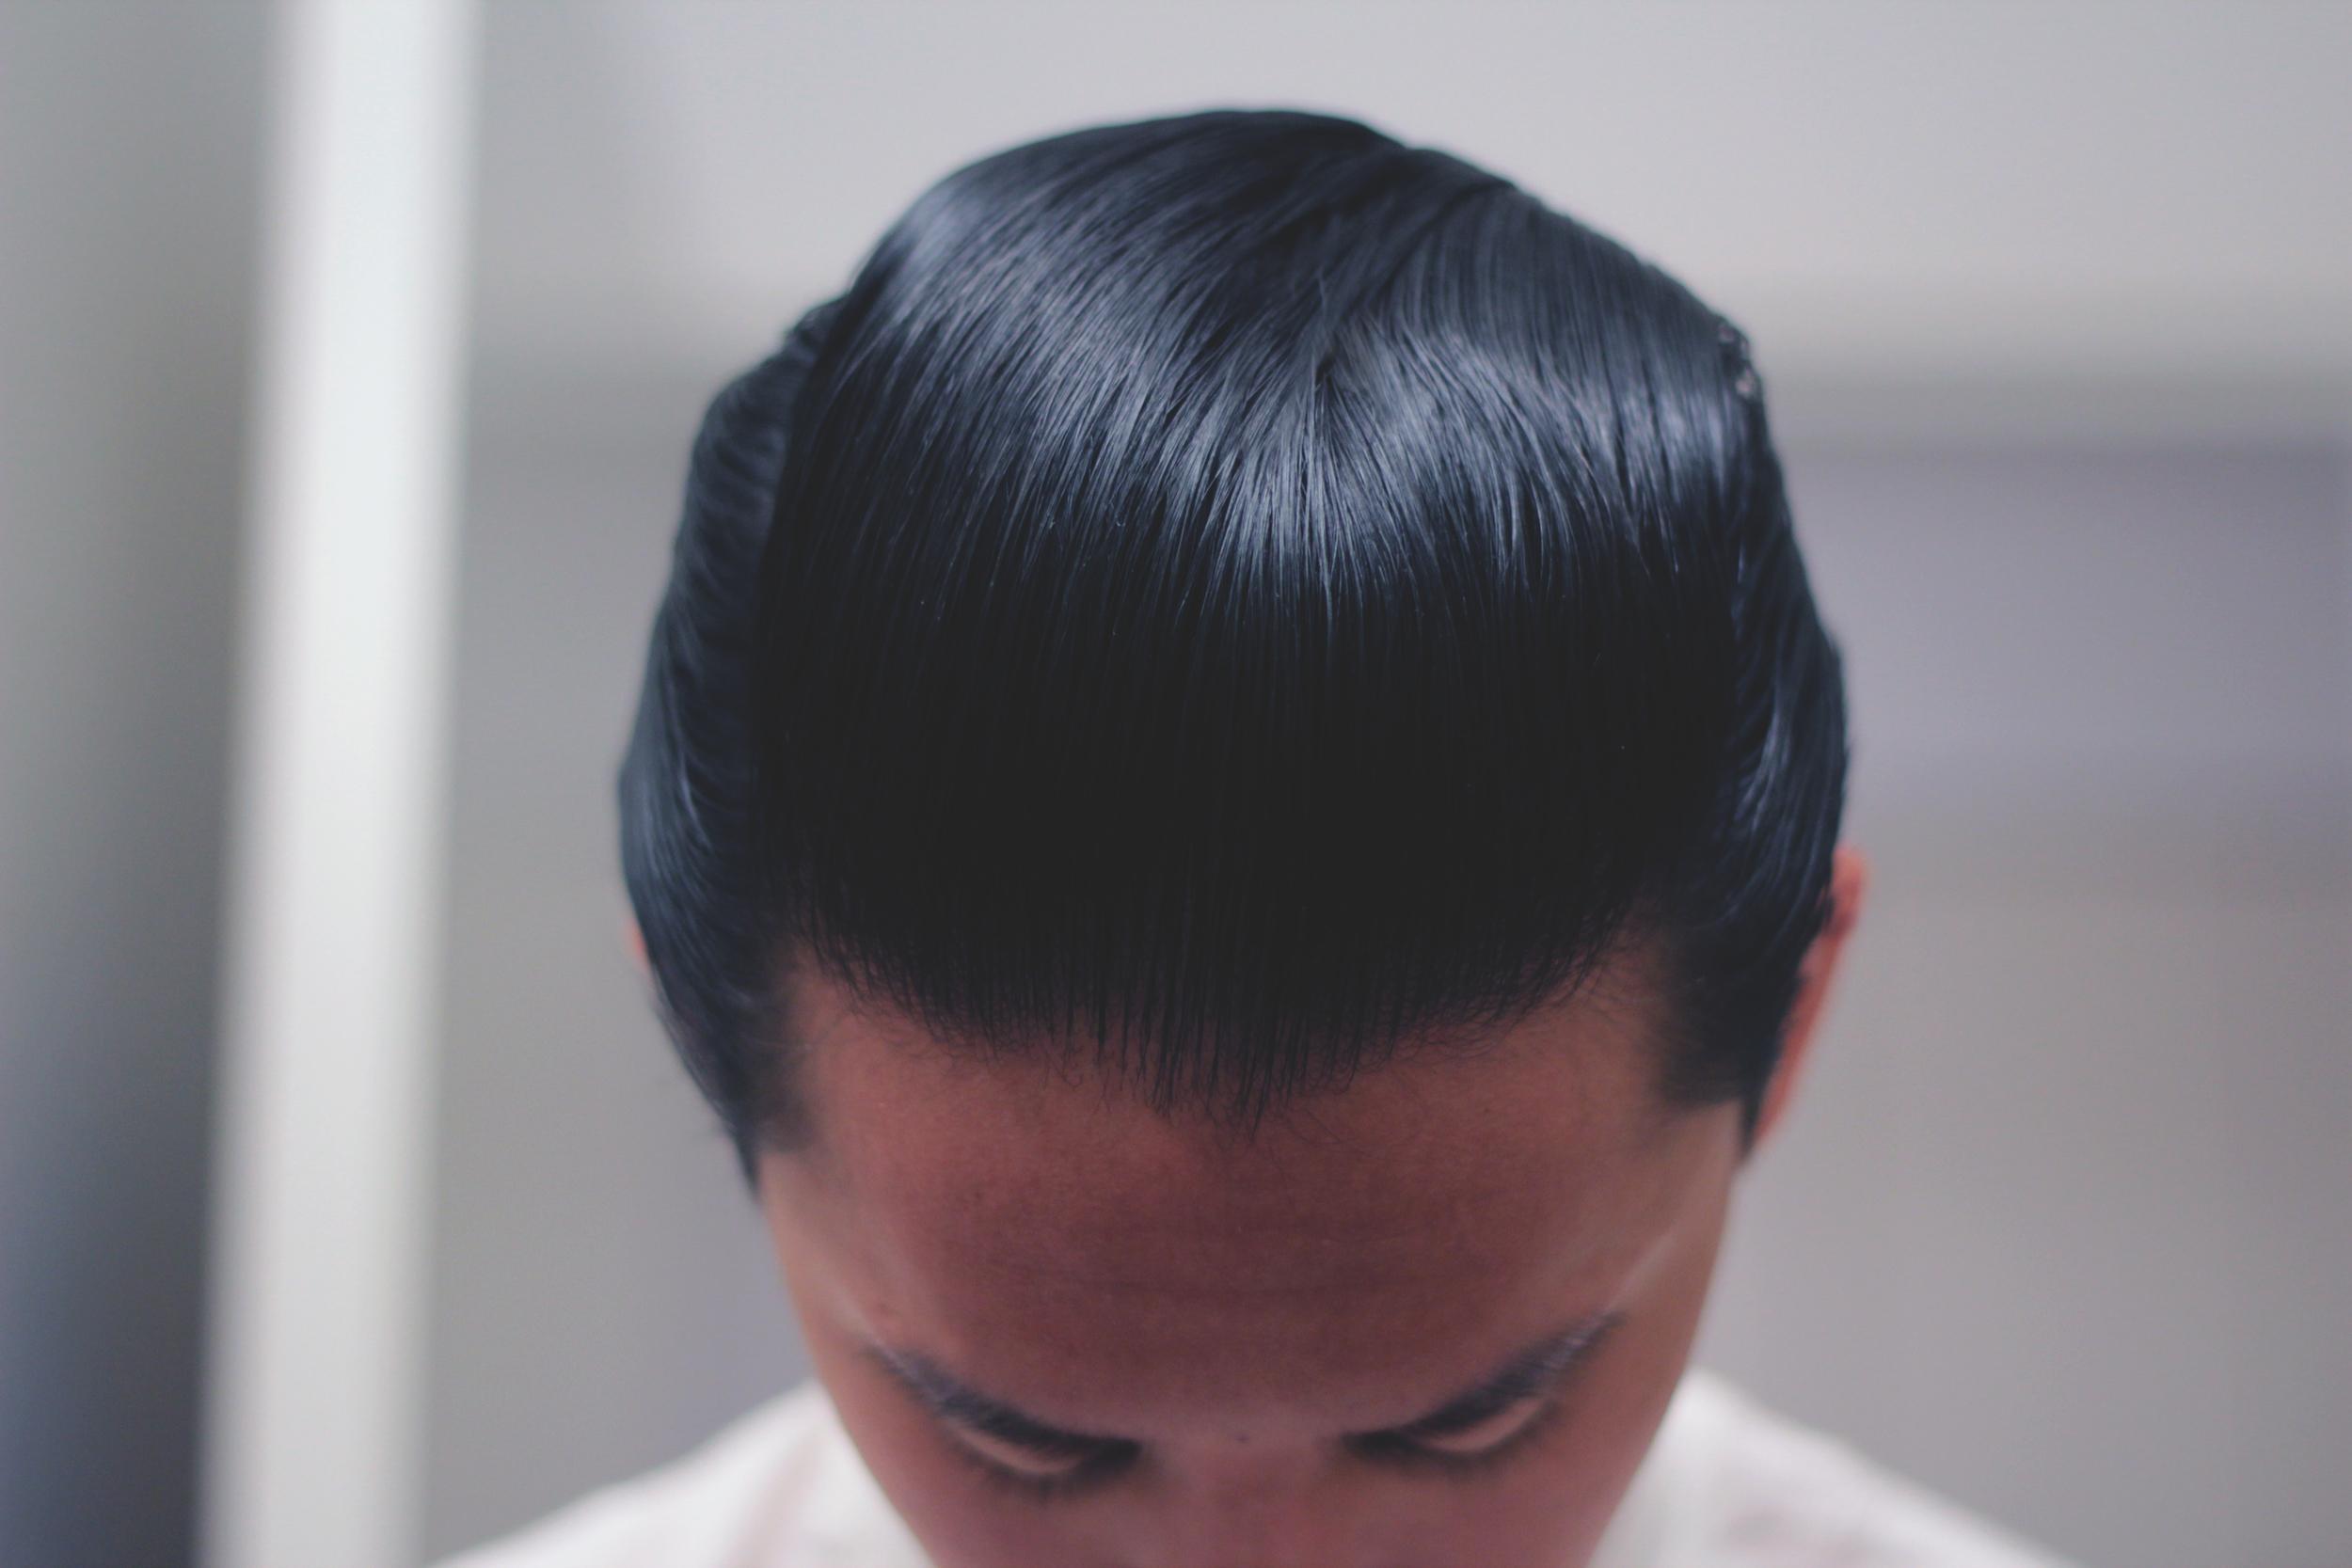 lockhart's goon grease hair pomade - pomp top